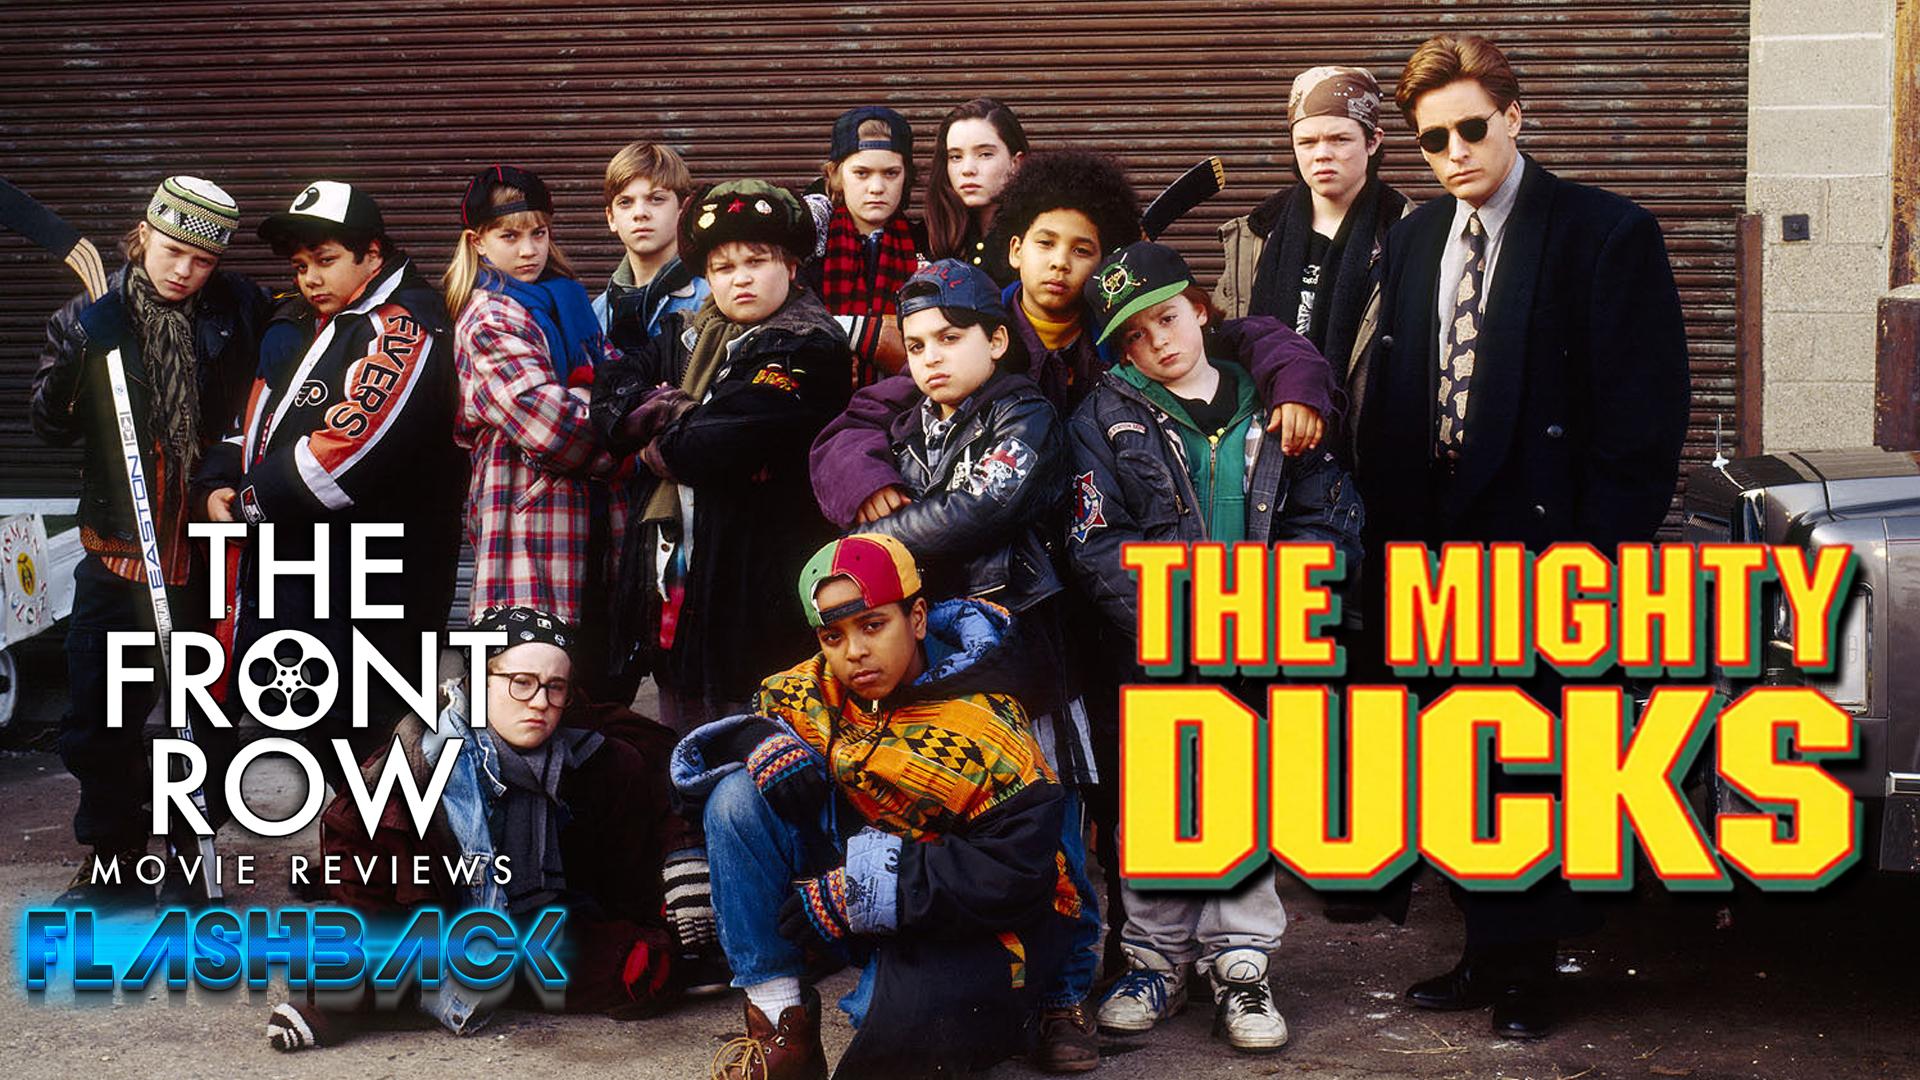 9caa34032 The Front Row Network: Front Row Flashbacks - The Mighty Ducks